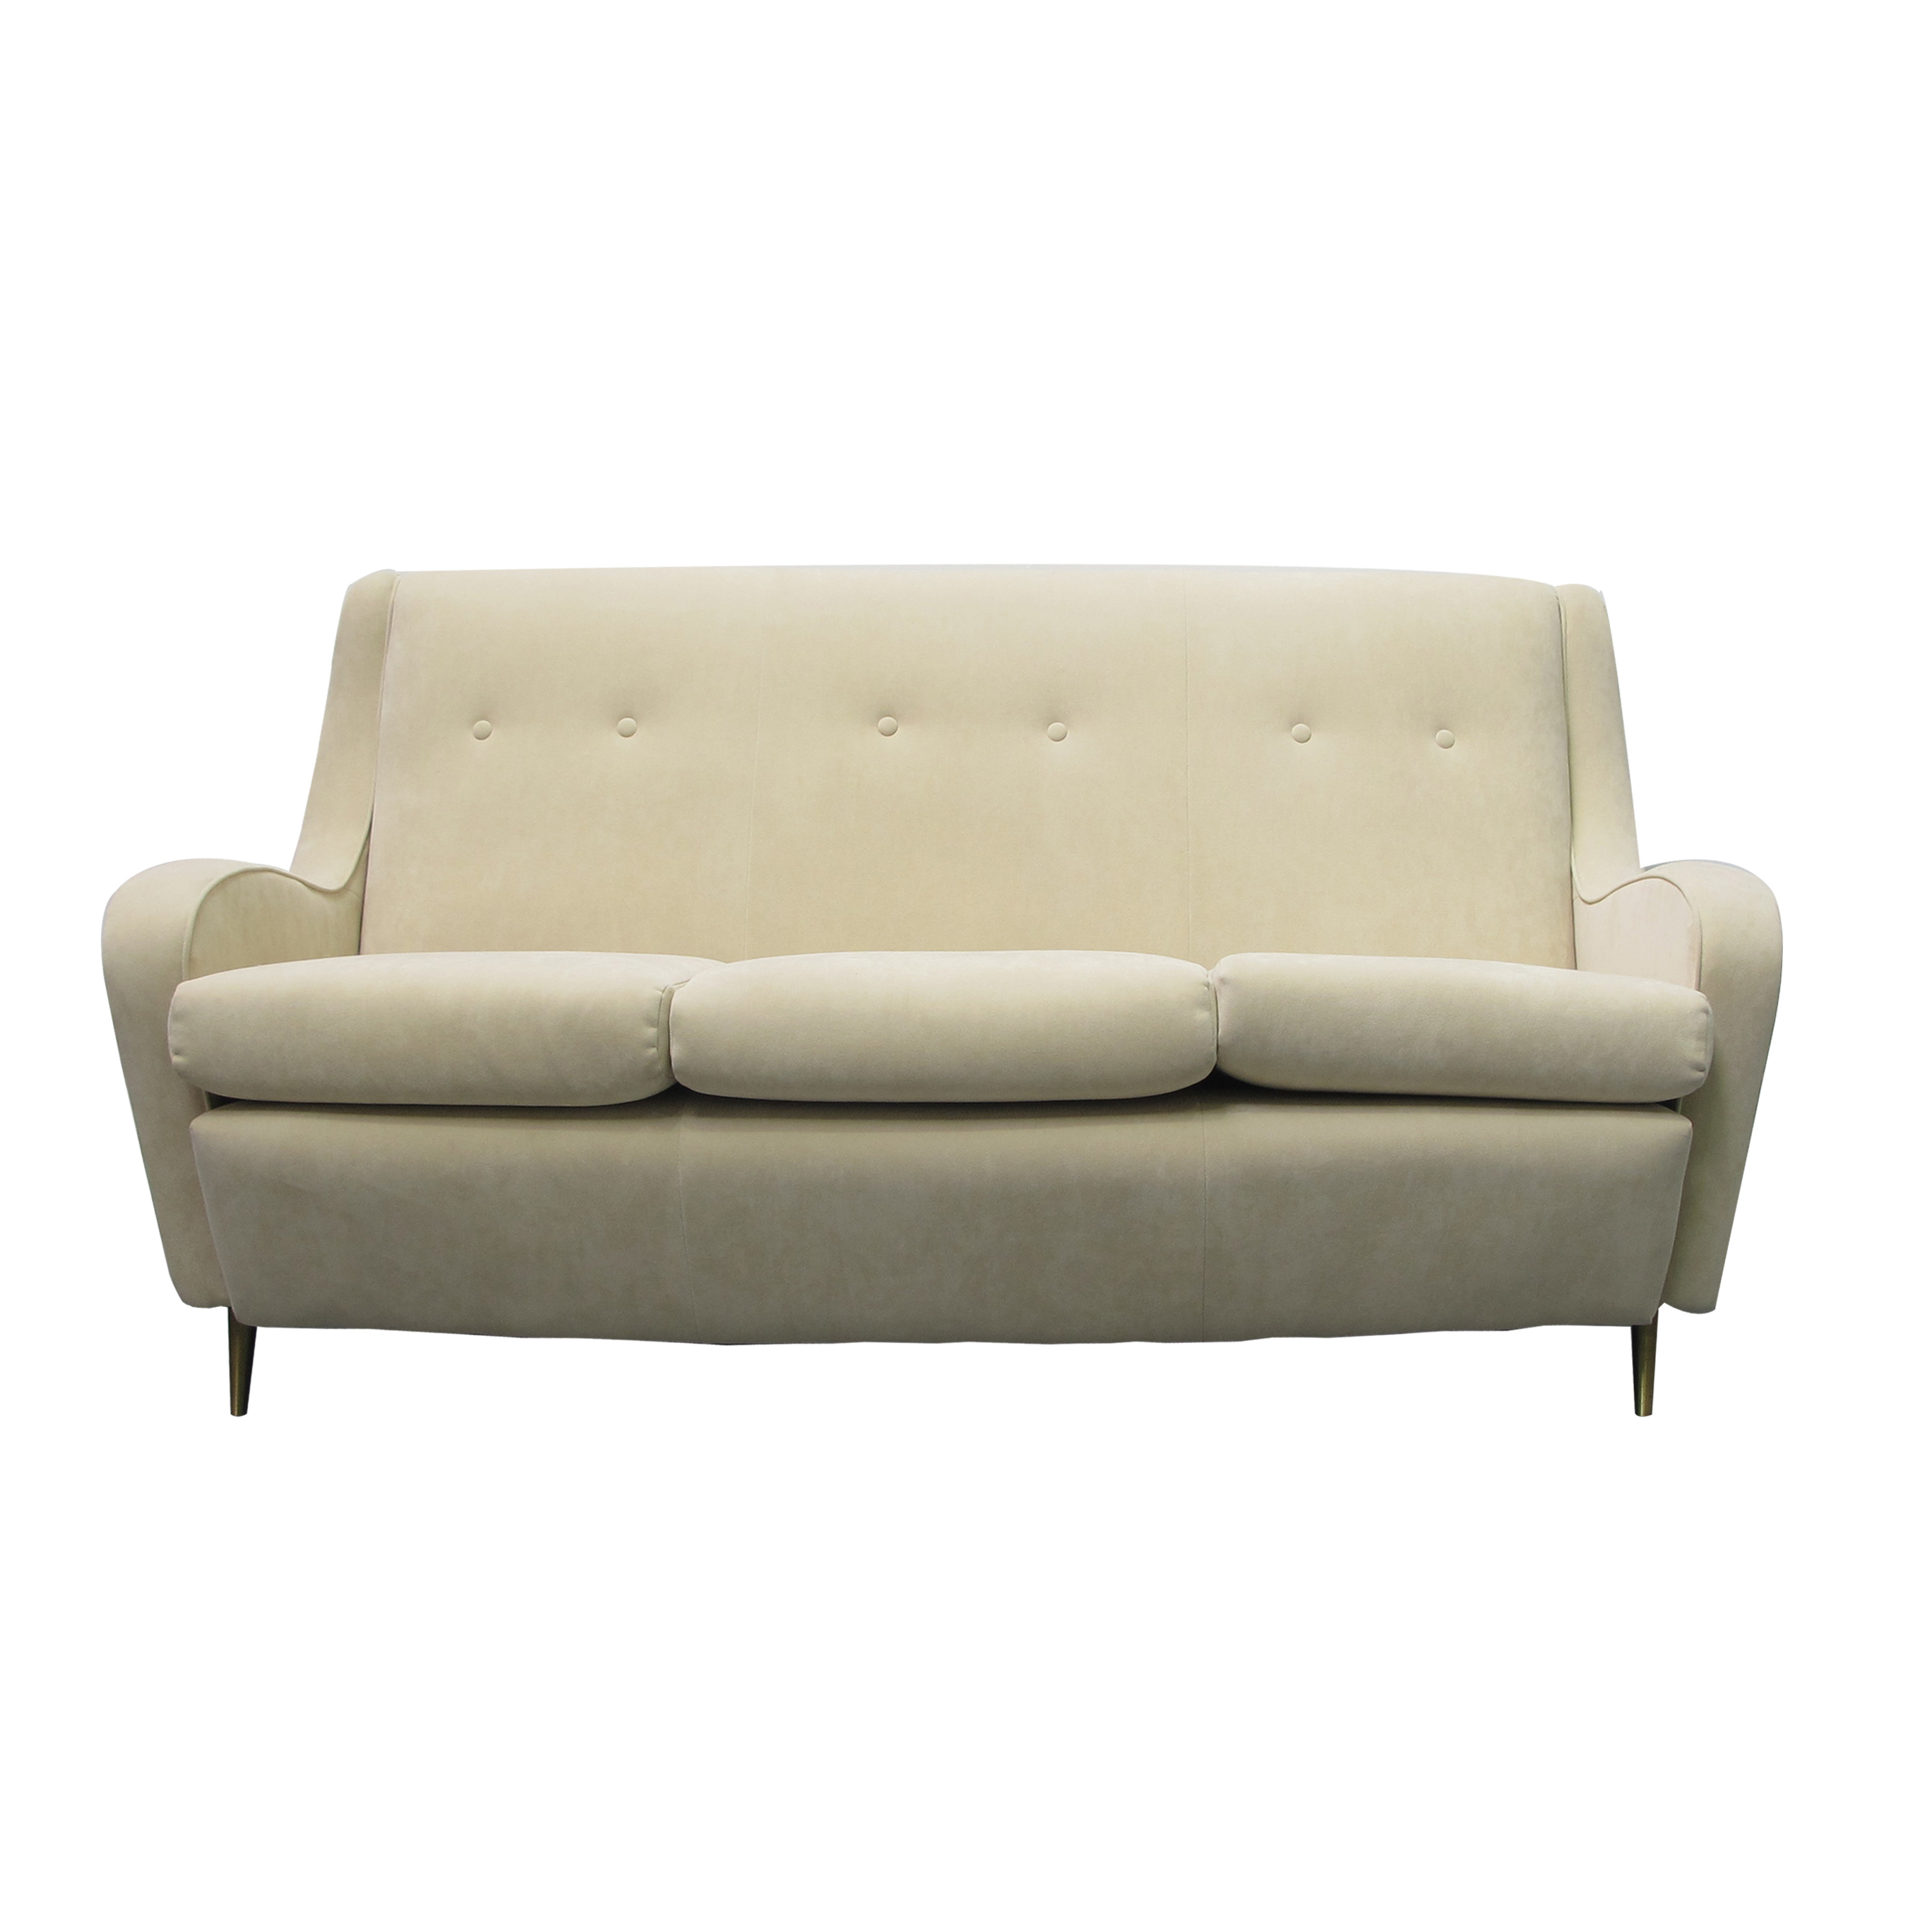 Vintage Italian Sofa Les Trois Gar§ons